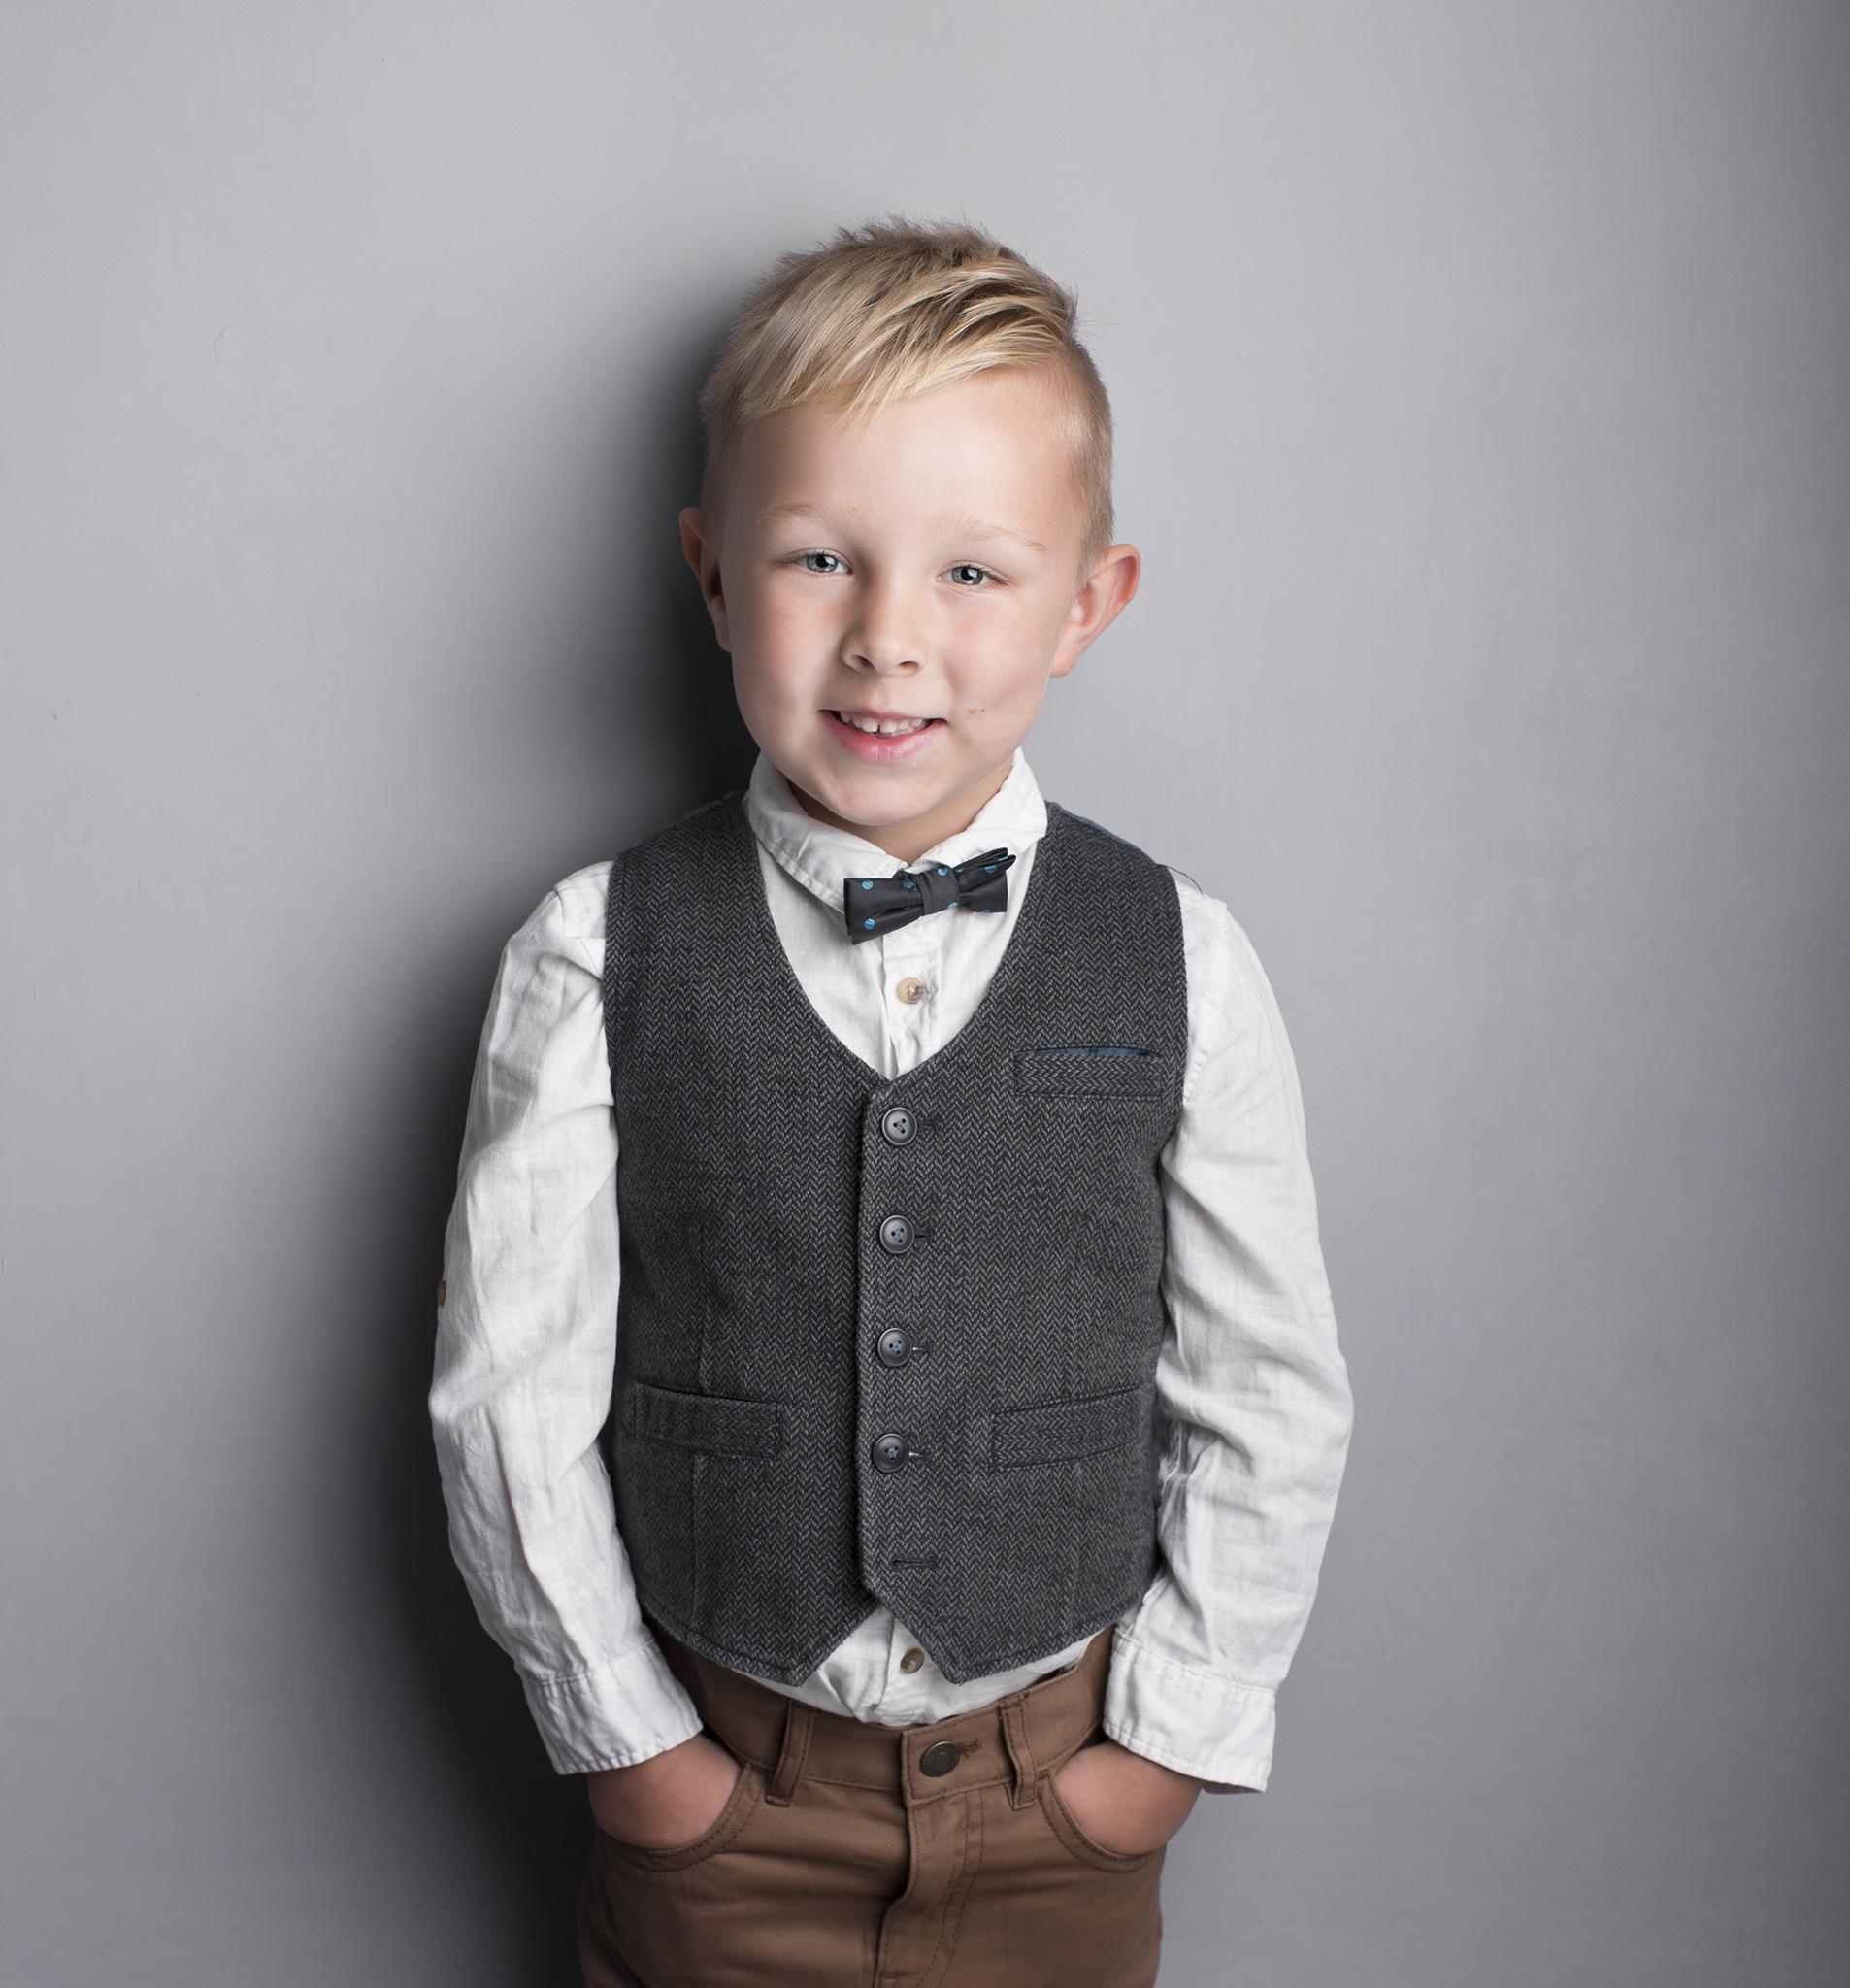 elizabethgfineartphotography_kingslangley_model_actor_jenson_01.jpg